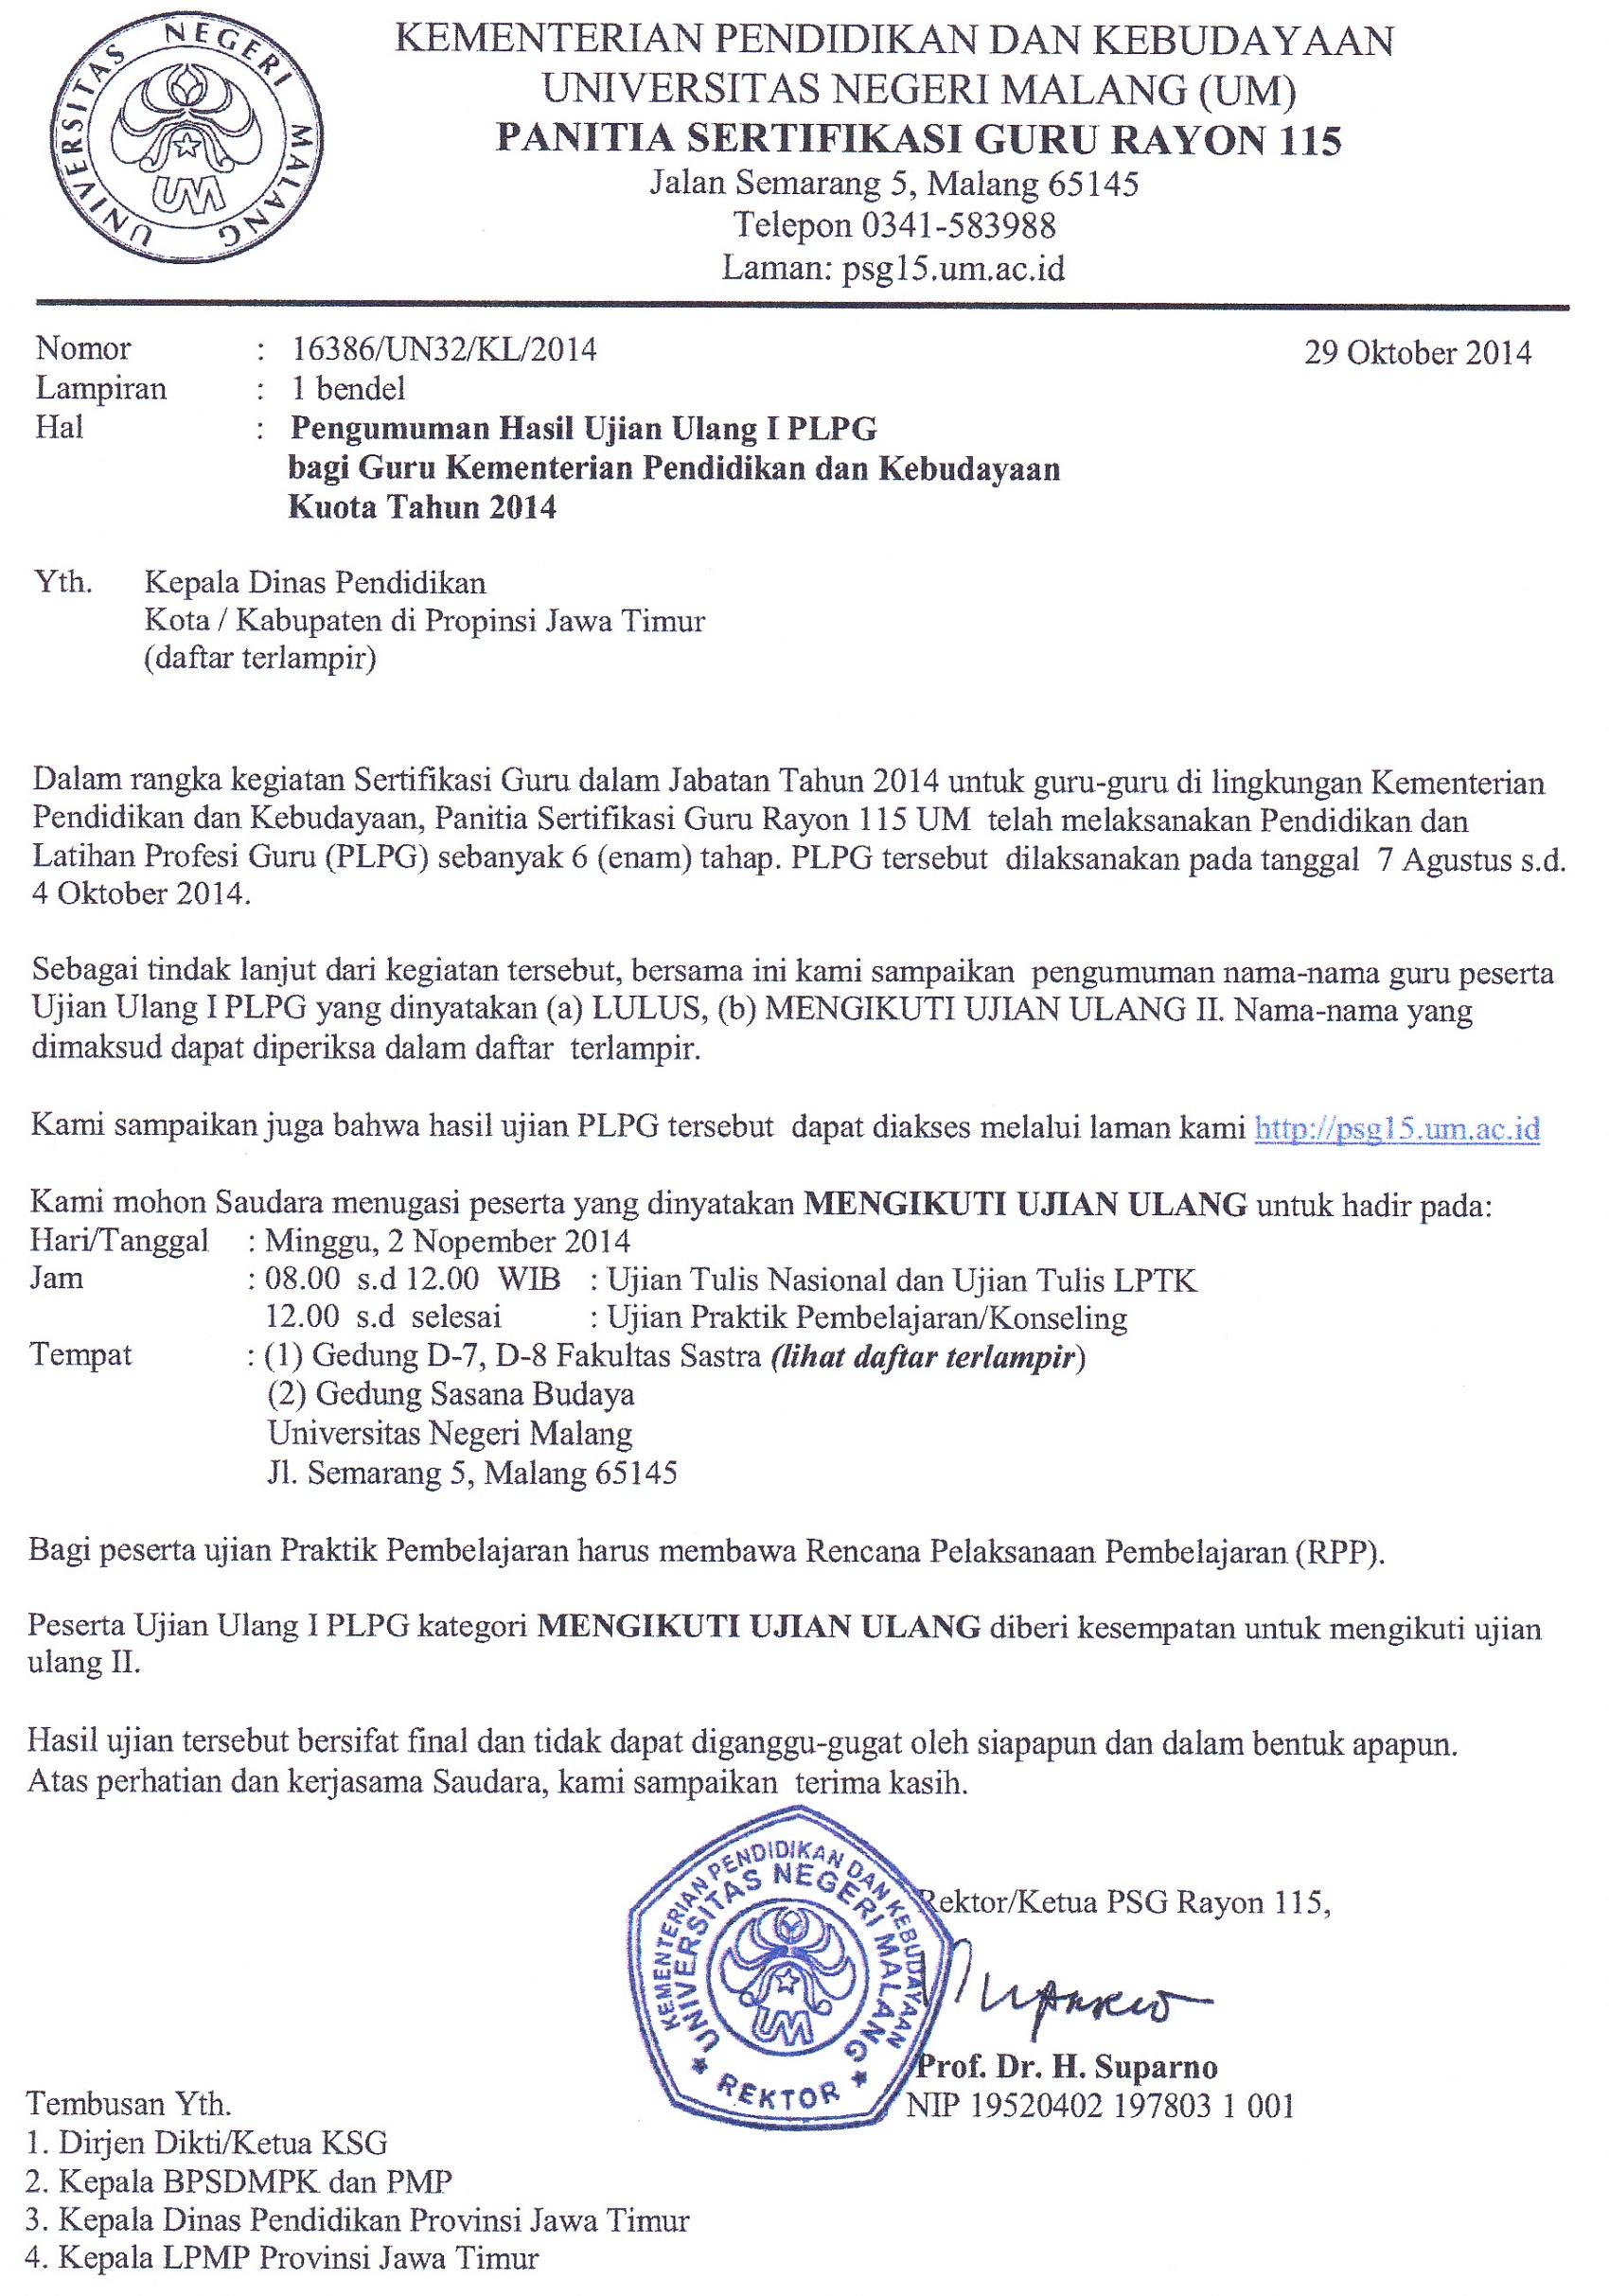 Cpns Lamongan Formasi Lowongan Cpns Sma Smk Ma Tahun 2016 Hasil Ujian Ulang I Plpg Universitas Negeri Malang Um